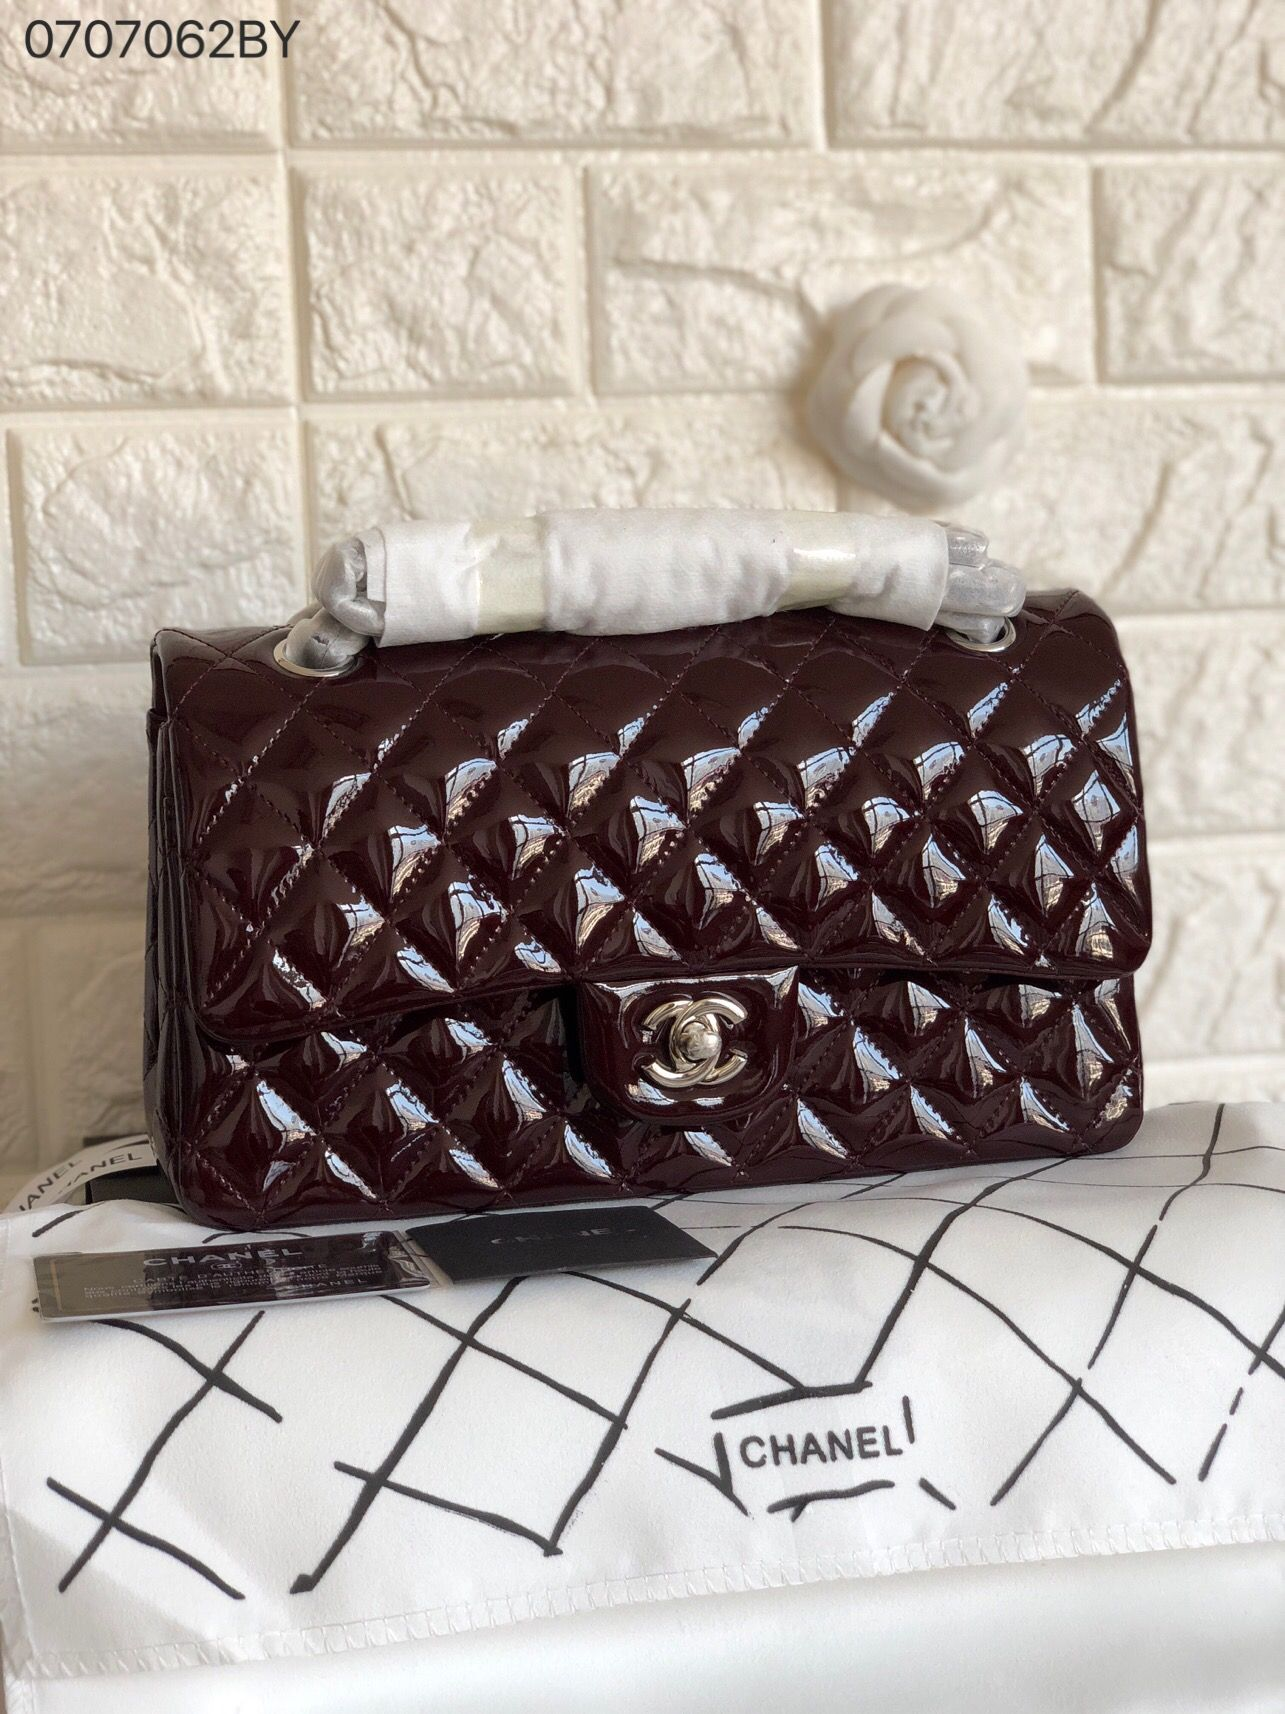 29cb055fd911 Chanel woman CF classic flap bag patent original leather version ...